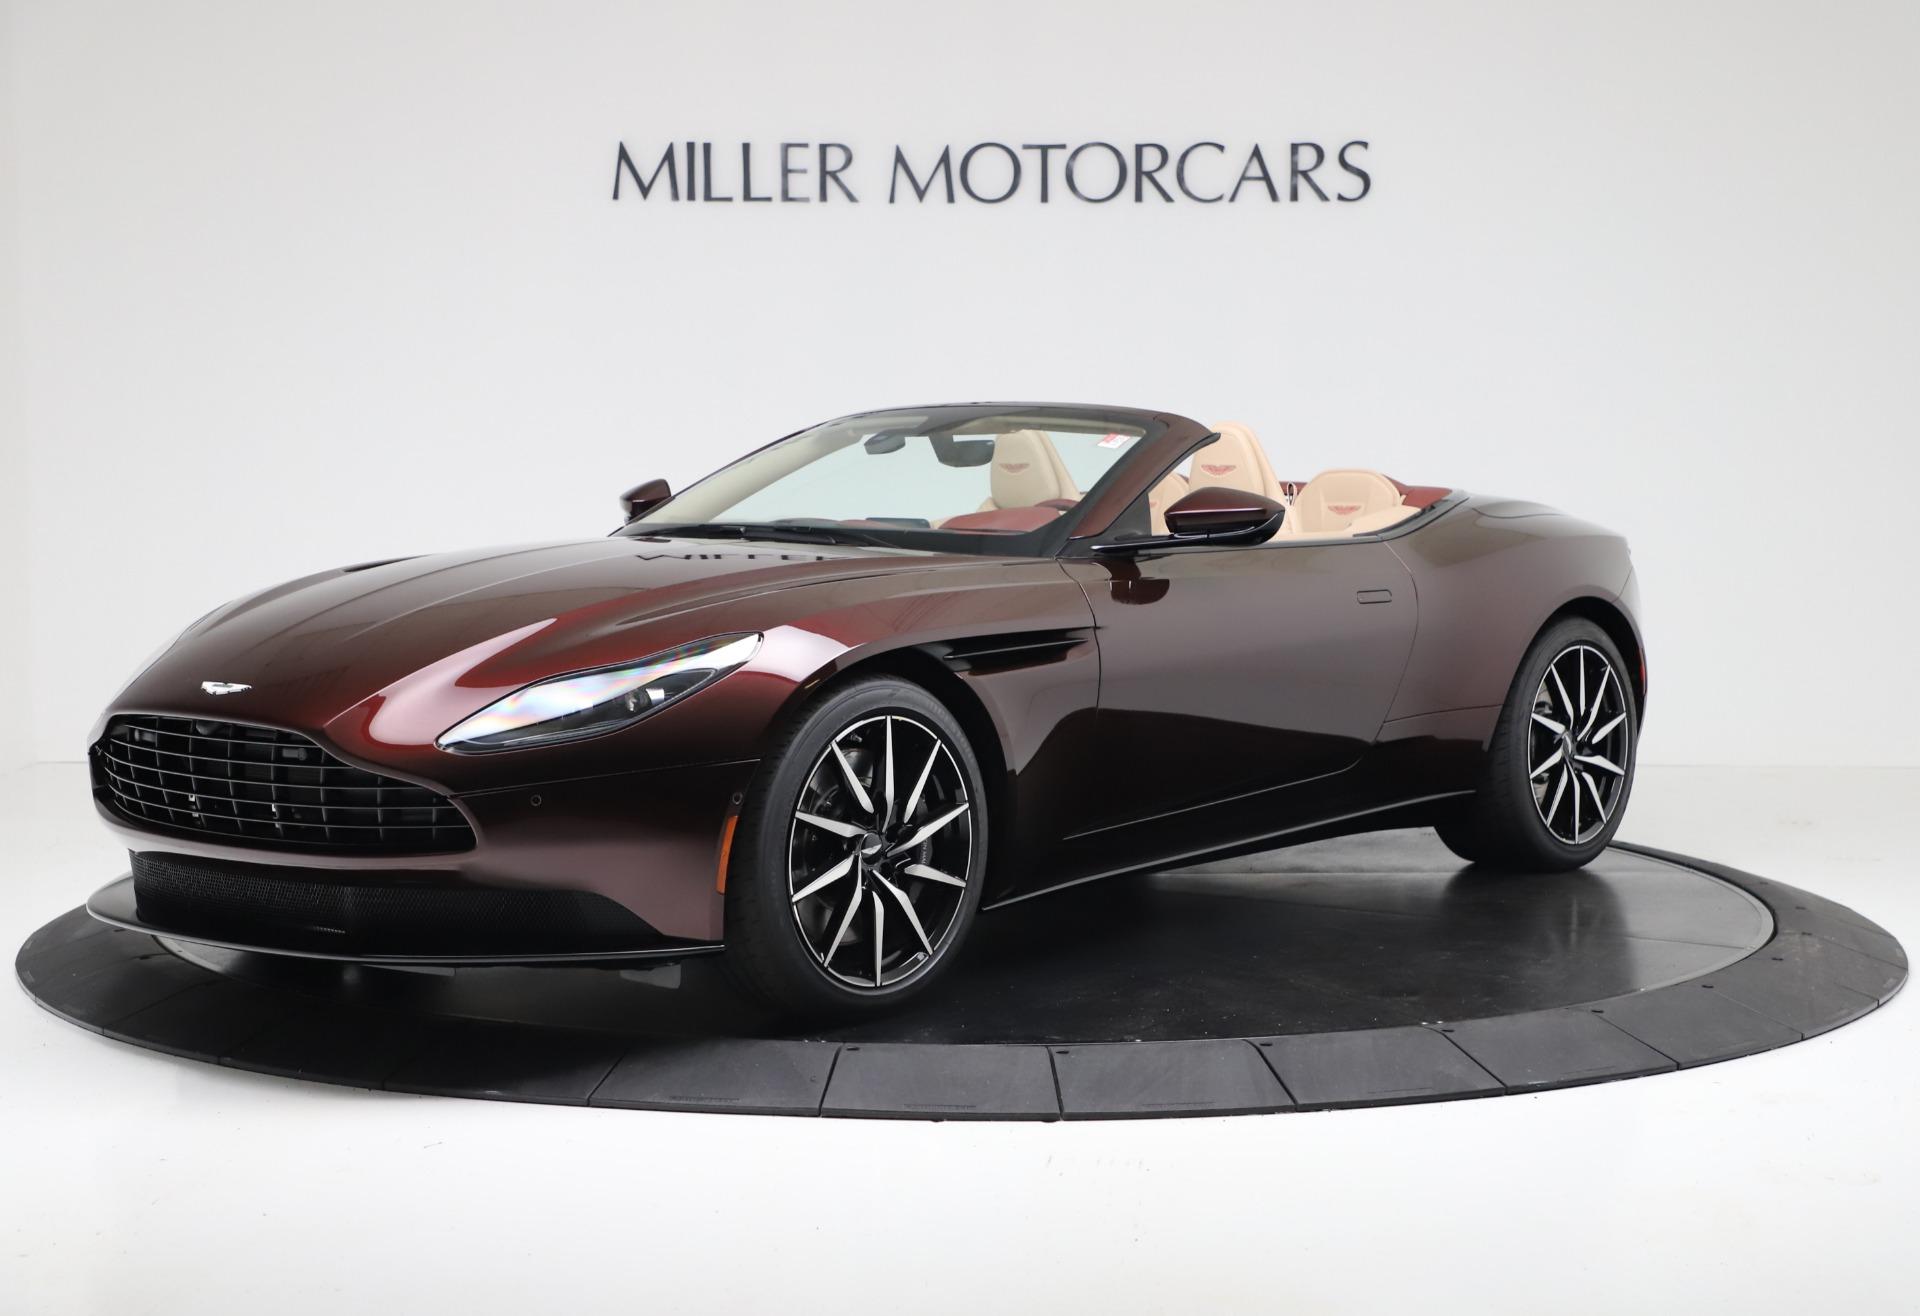 Used 2020 Aston Martin DB11 Volante for sale Sold at Alfa Romeo of Greenwich in Greenwich CT 06830 1